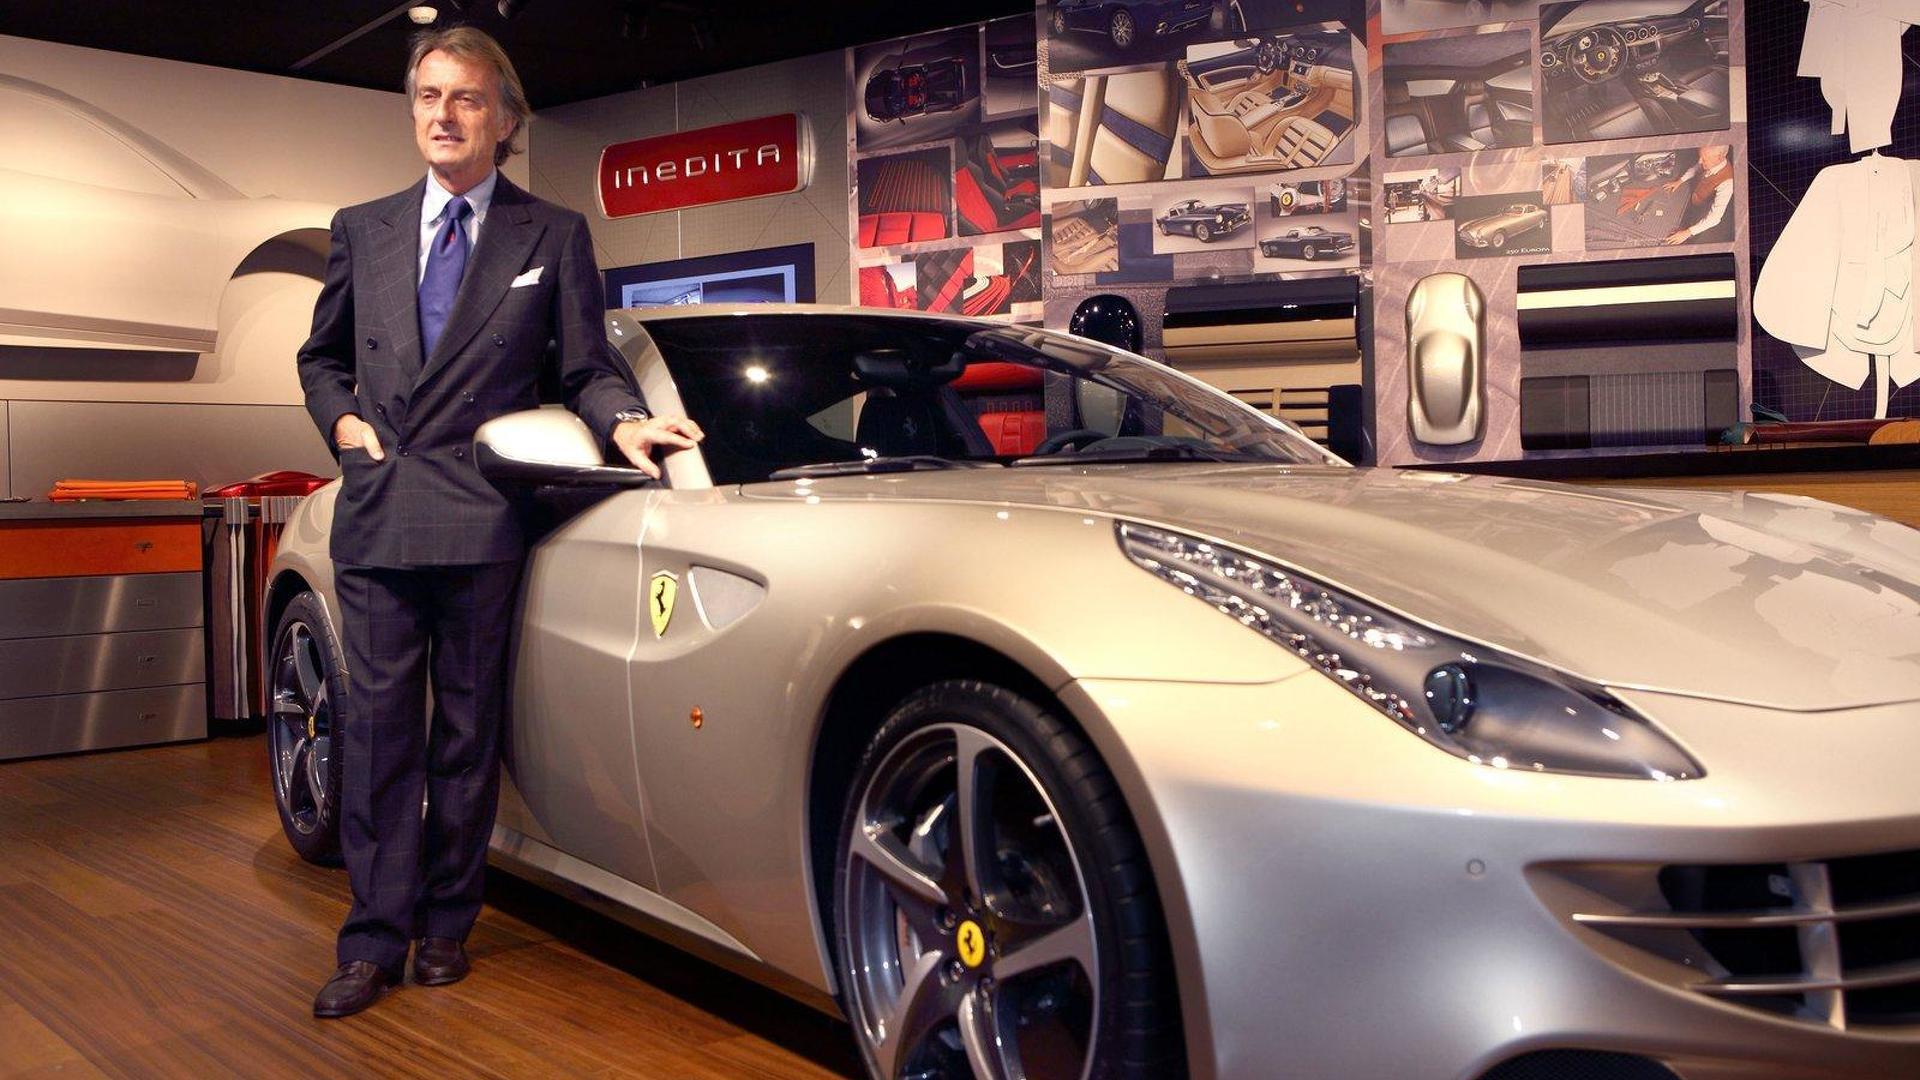 Ferrari Chairman Luca di Montezemolo running for Italian presidency - report